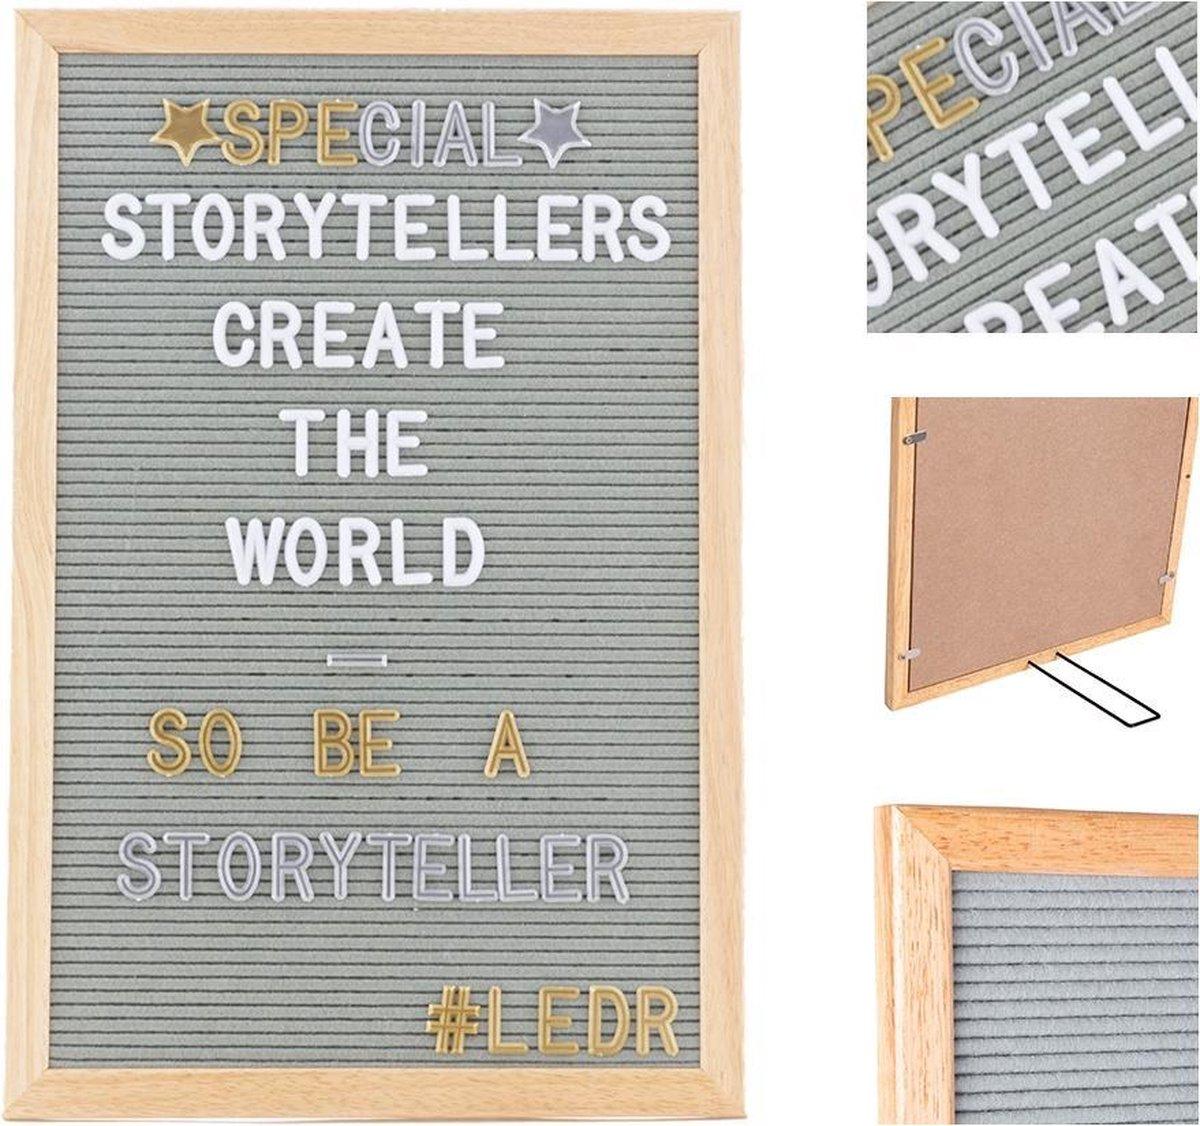 LEDR® Letterbord 30 x 45 Grijs – Inclusief 354 letters, symbolen & emoticons – Inclusief verstelbaar standaard - Eiken houten frame - LEDR